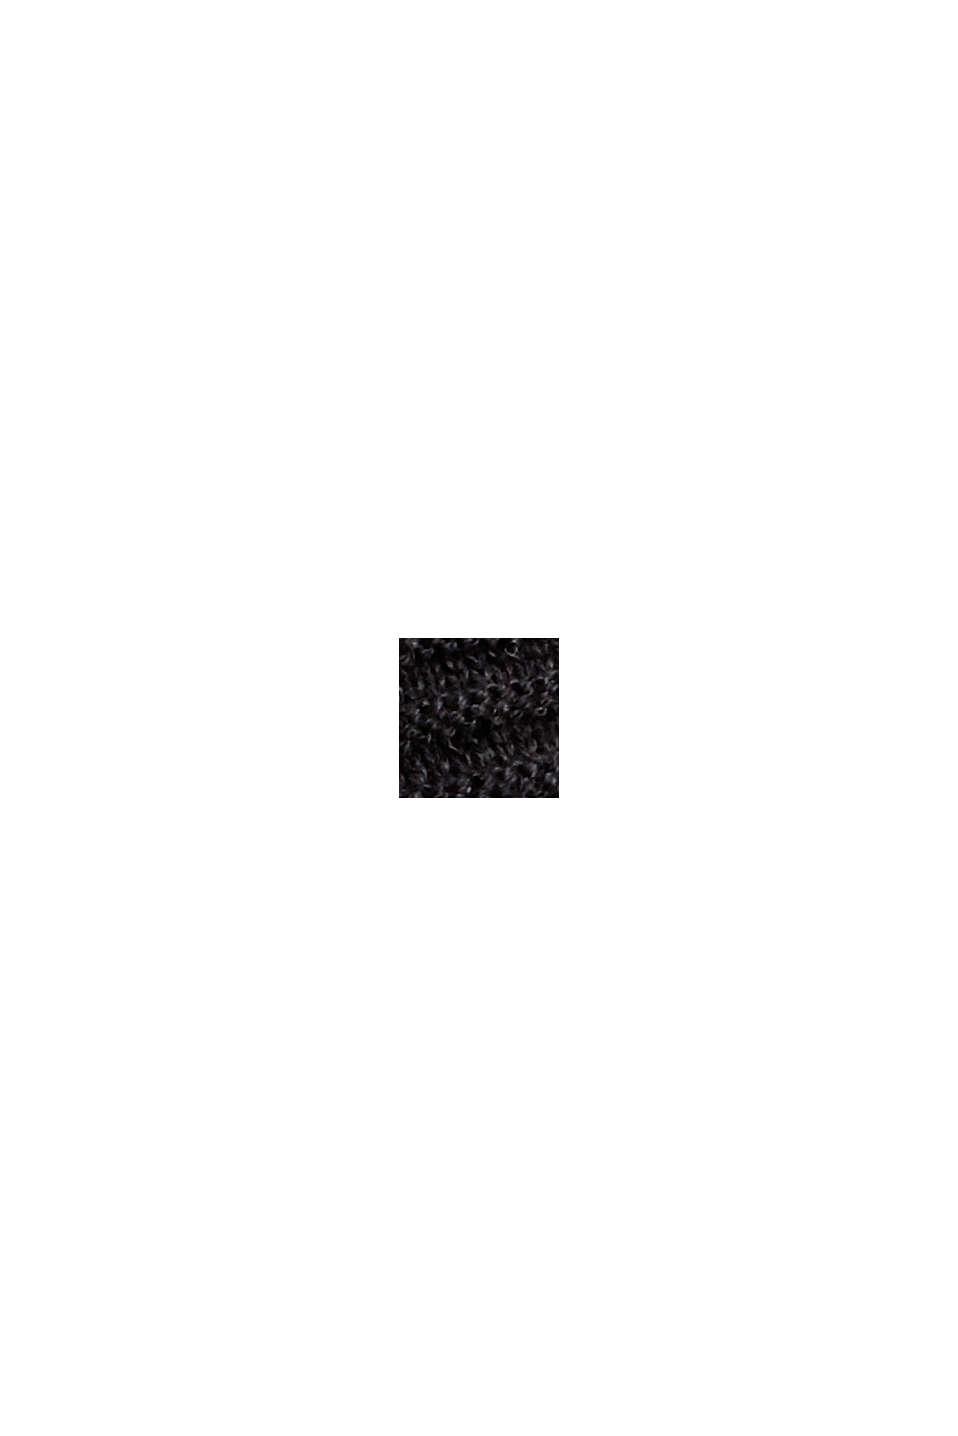 Geribde trui met kraag met tunnelkoord, katoen, BLACK, swatch